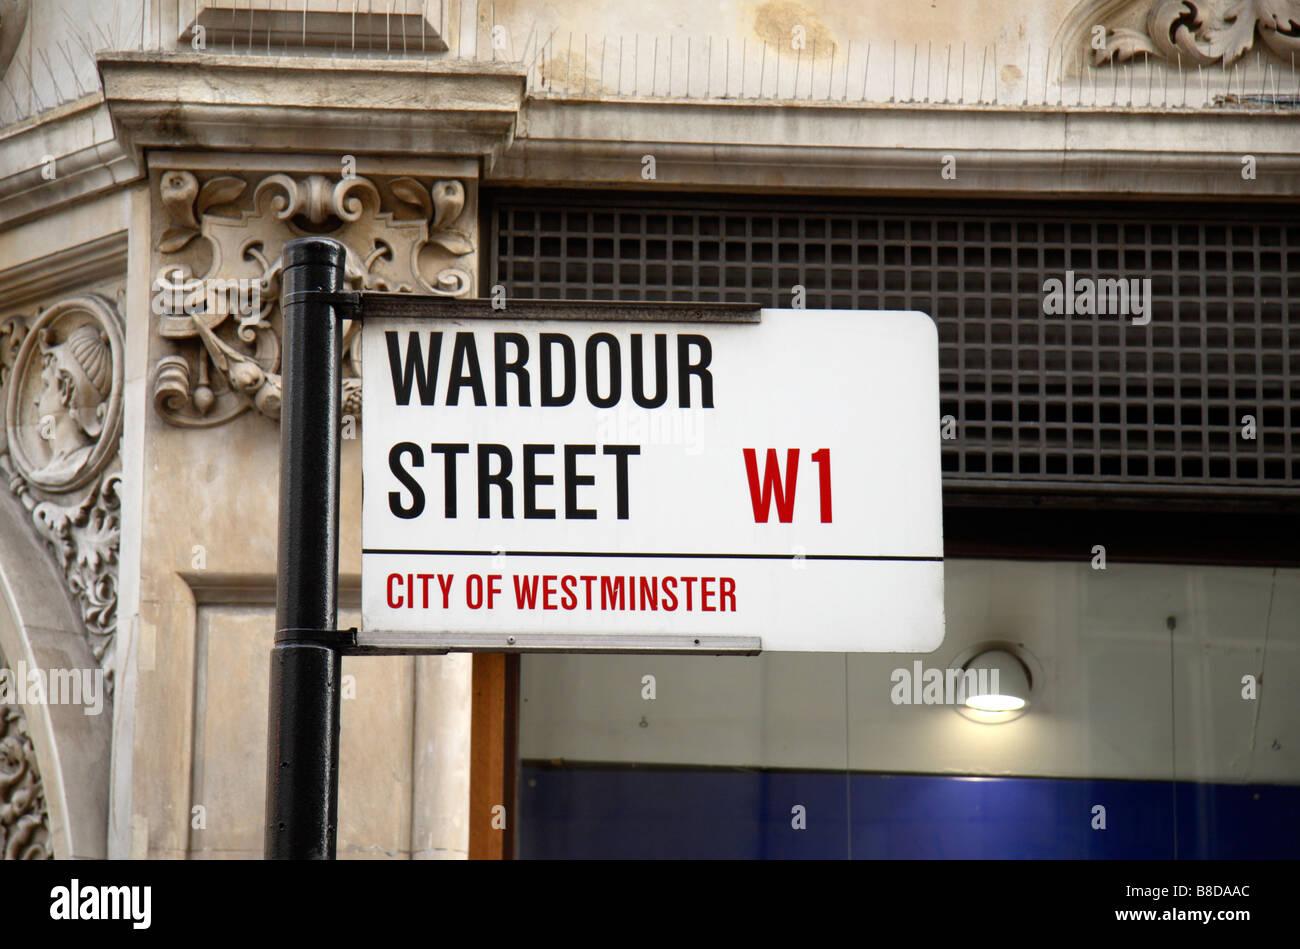 Street sign for Wardour Street, Westminster, London.  Jan 2009 - Stock Image